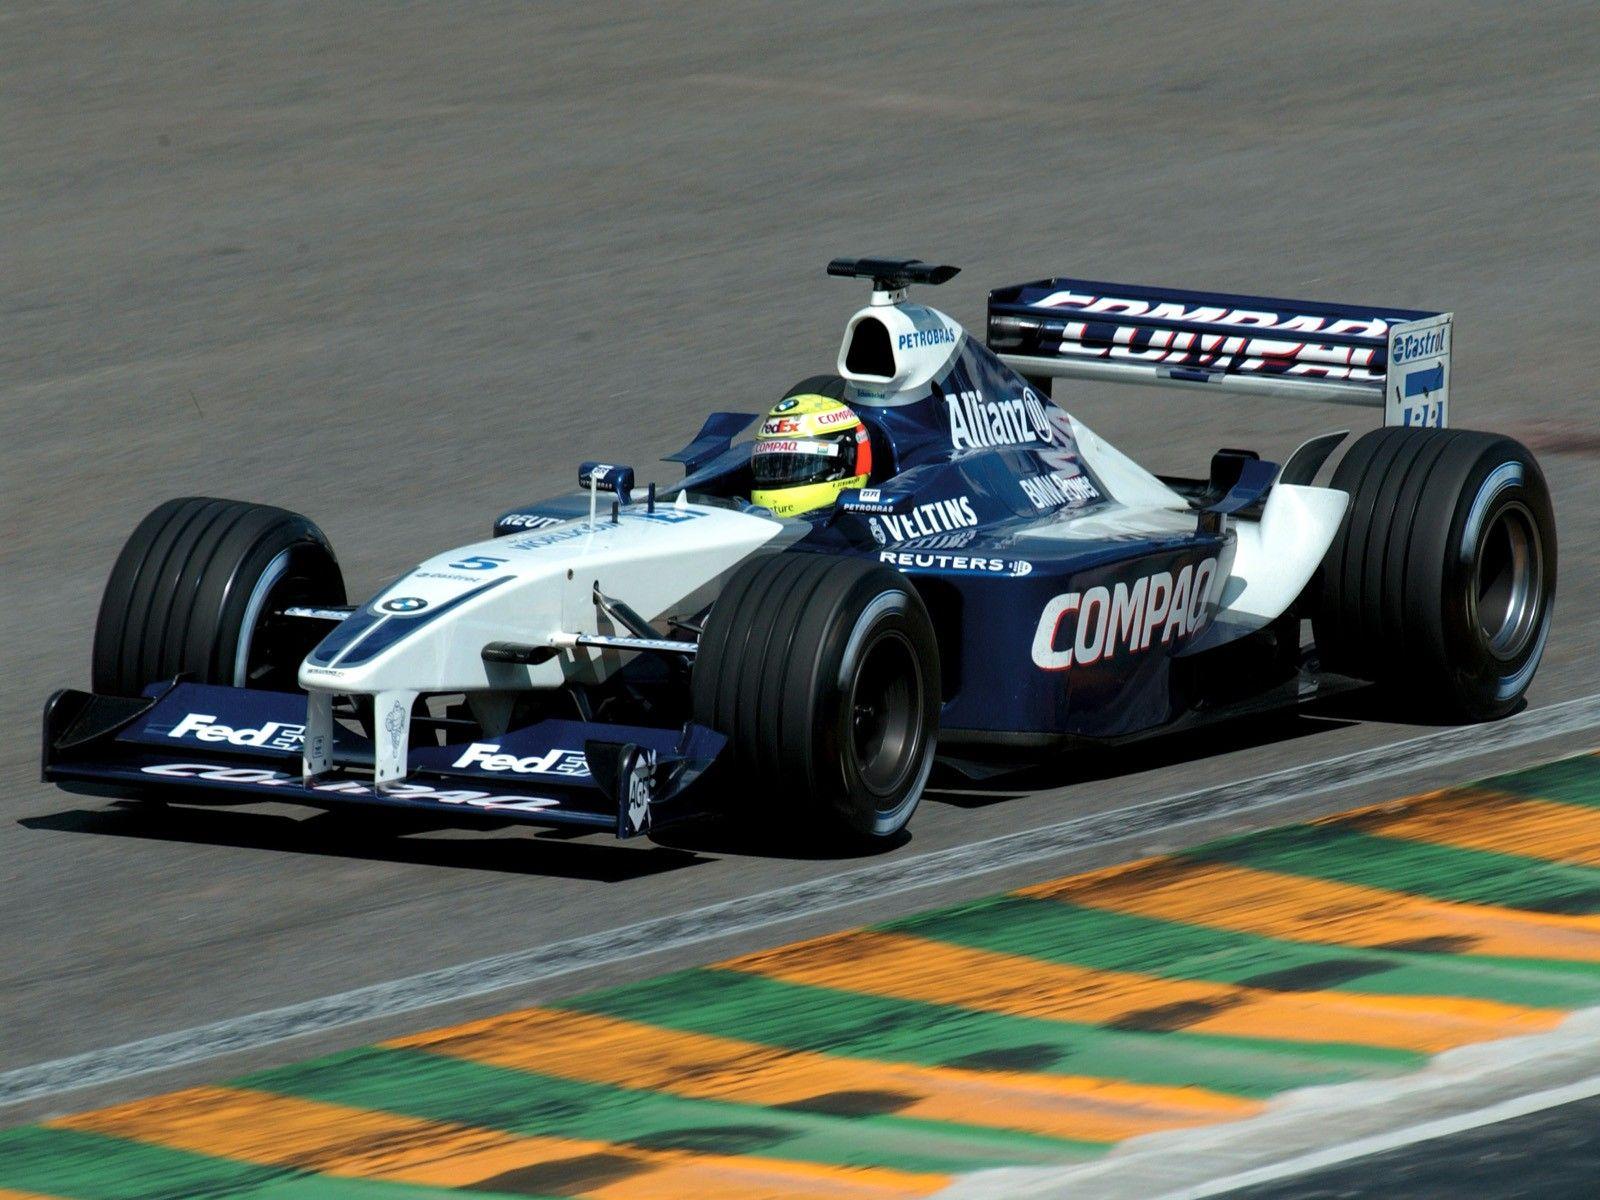 2002 Williams FW24  BMW Ralf Schumacher  2002 Formua 1